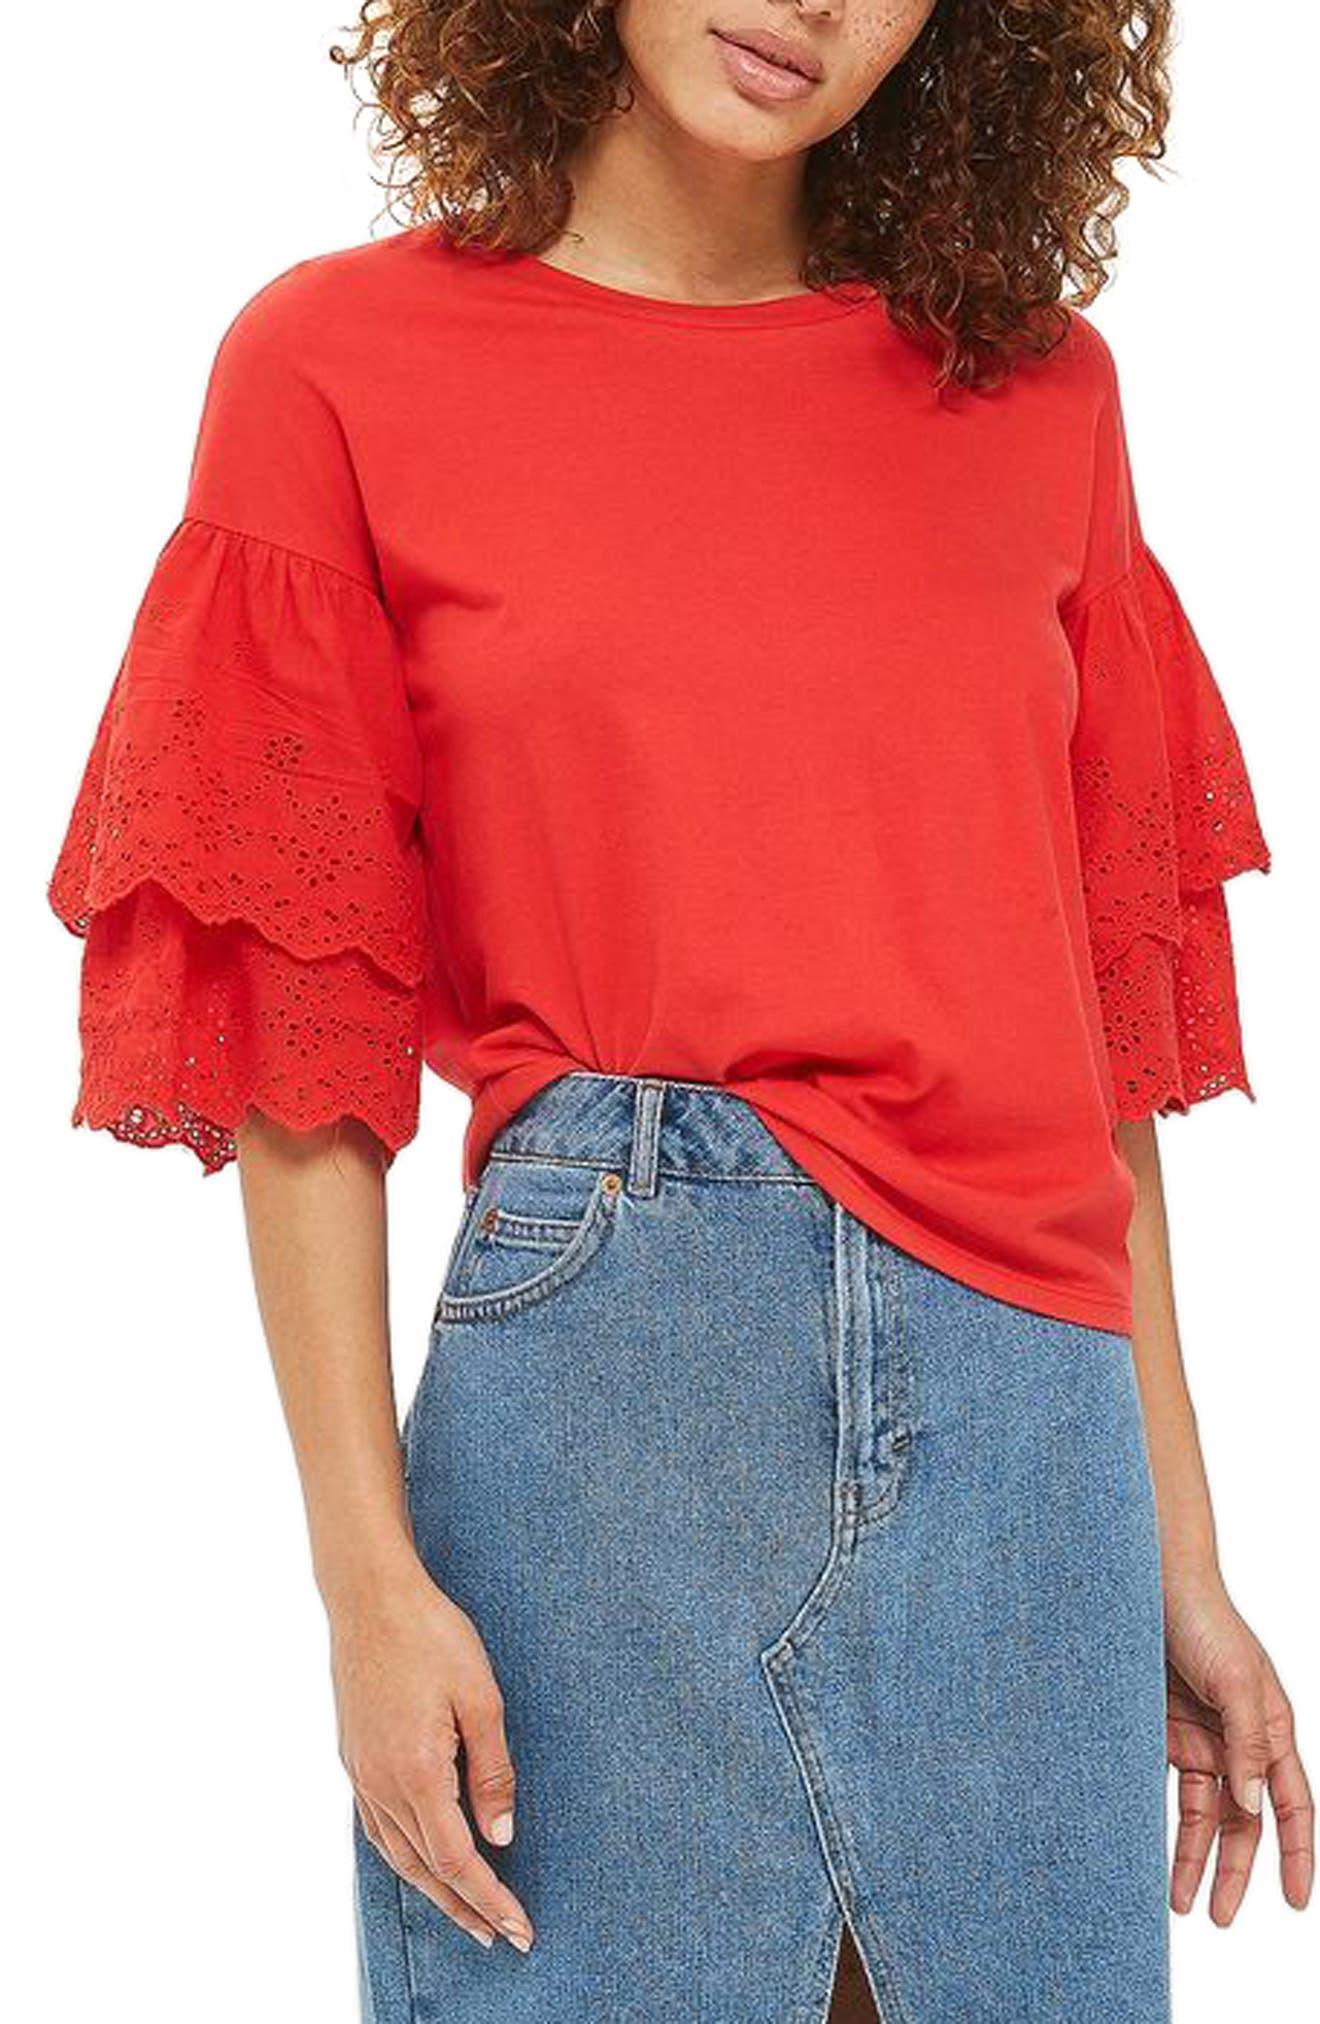 Alternate Image 1 Selected - Topshop Eyelet Layer Sleeve Tee T-Shirt (Regular & Petite)